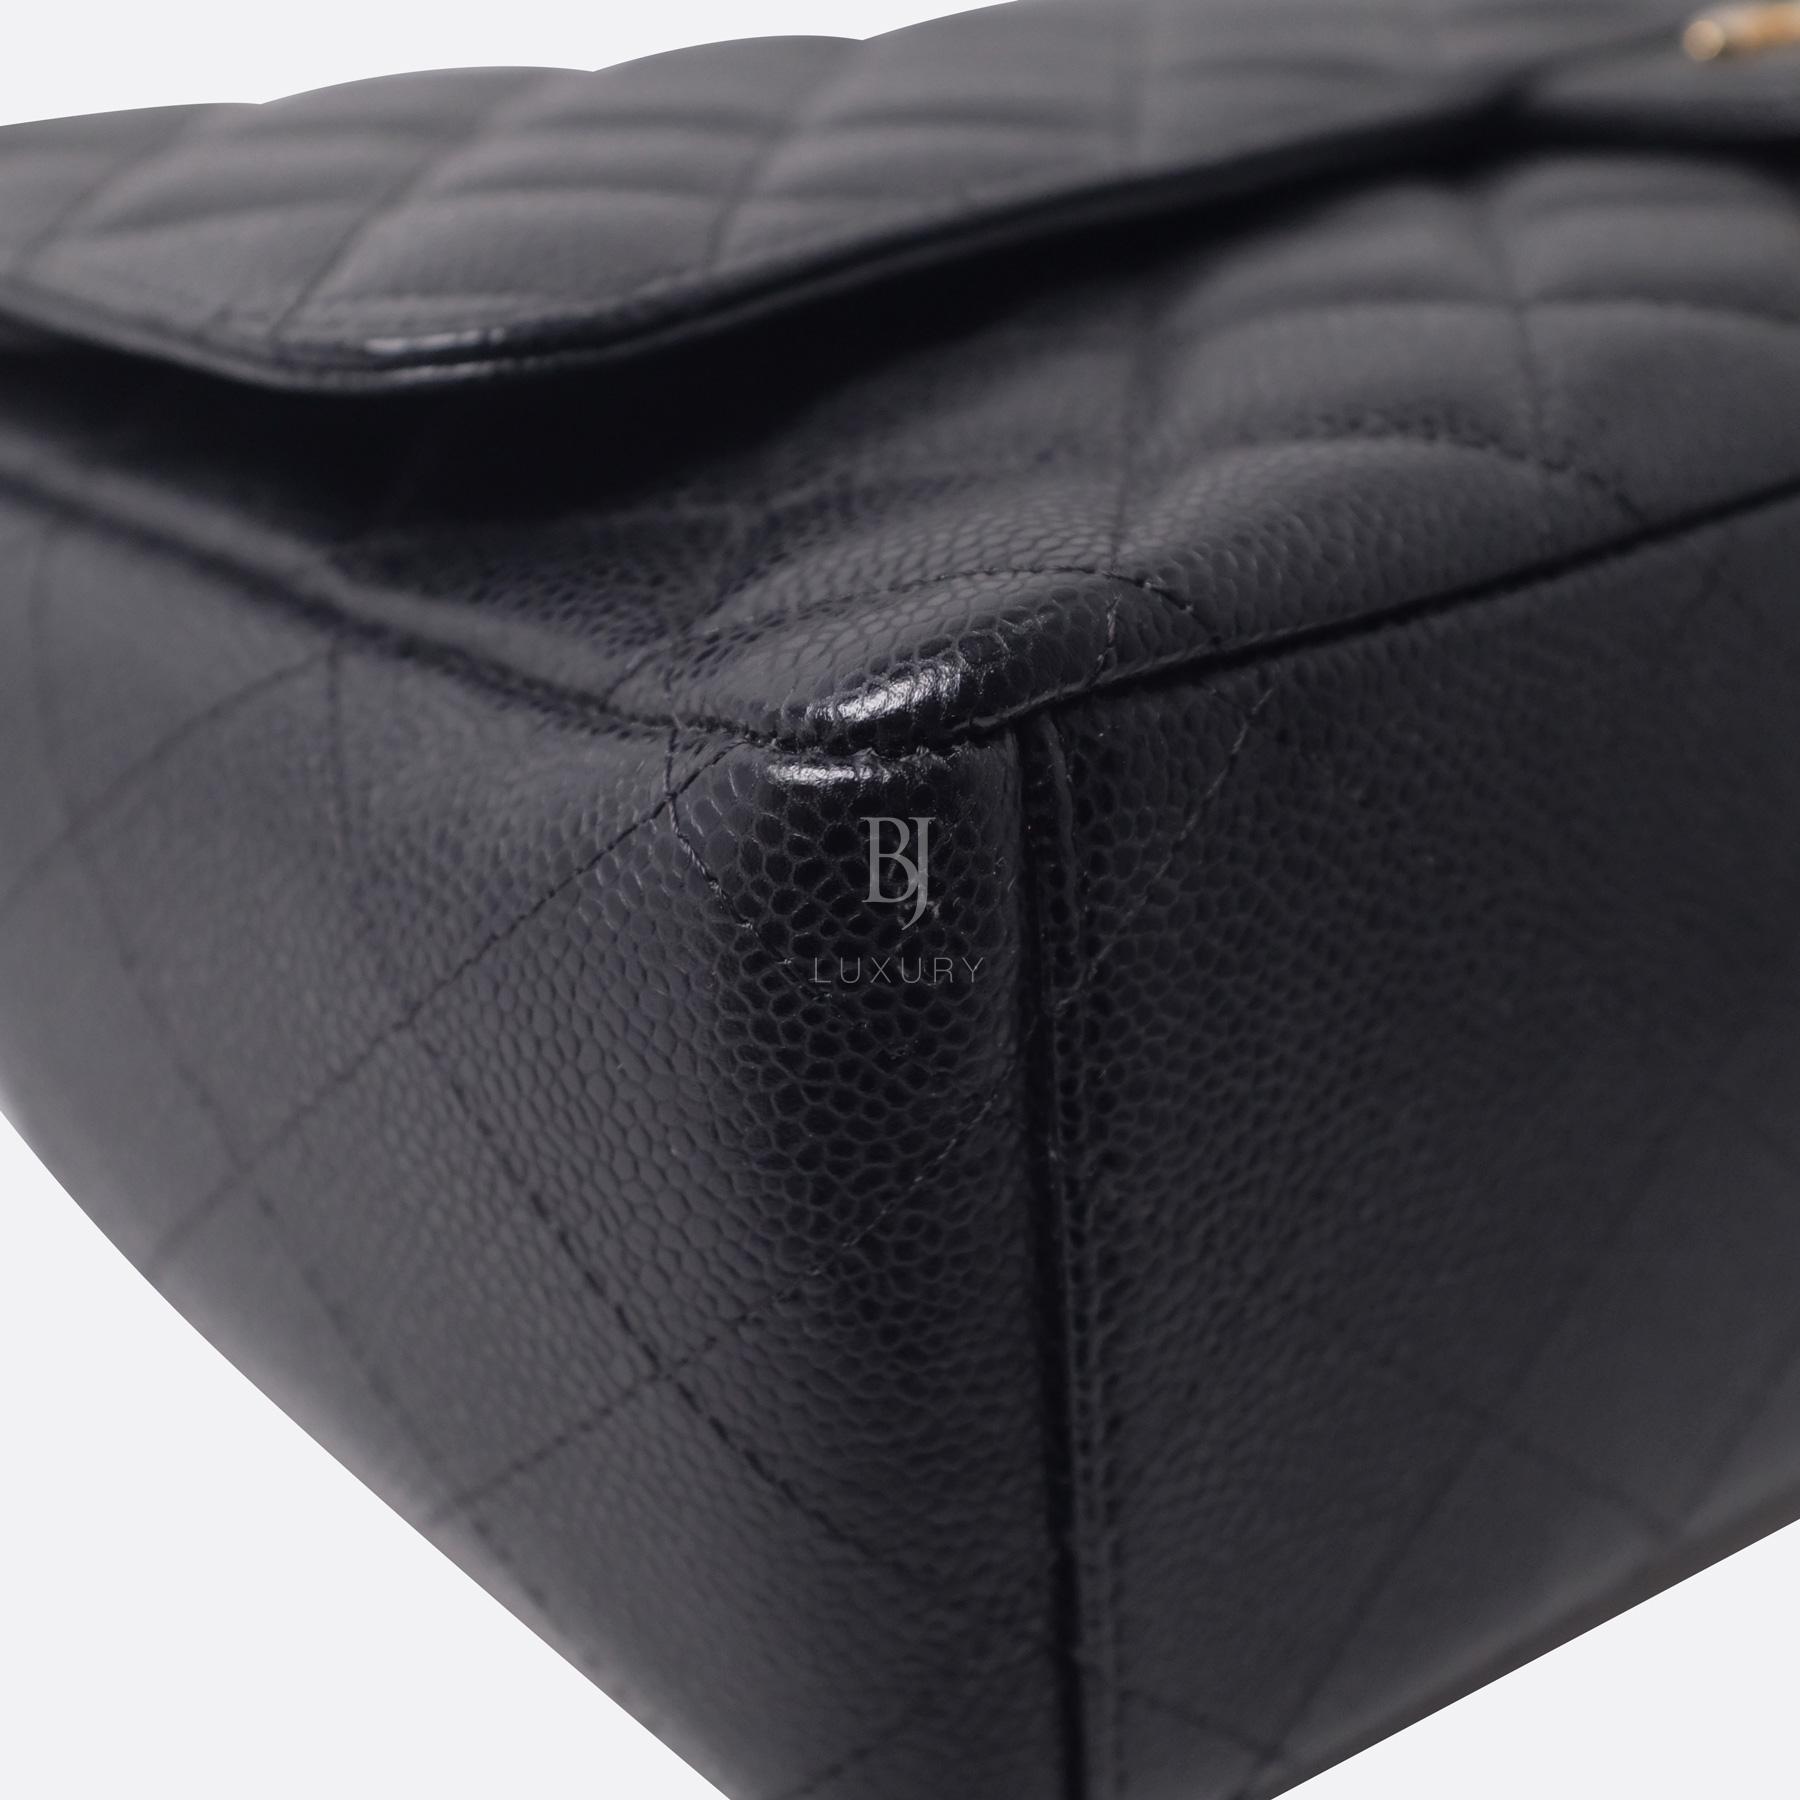 Chanel Classic Handbag Caviar Maxi Black BJ Luxury 8.jpg